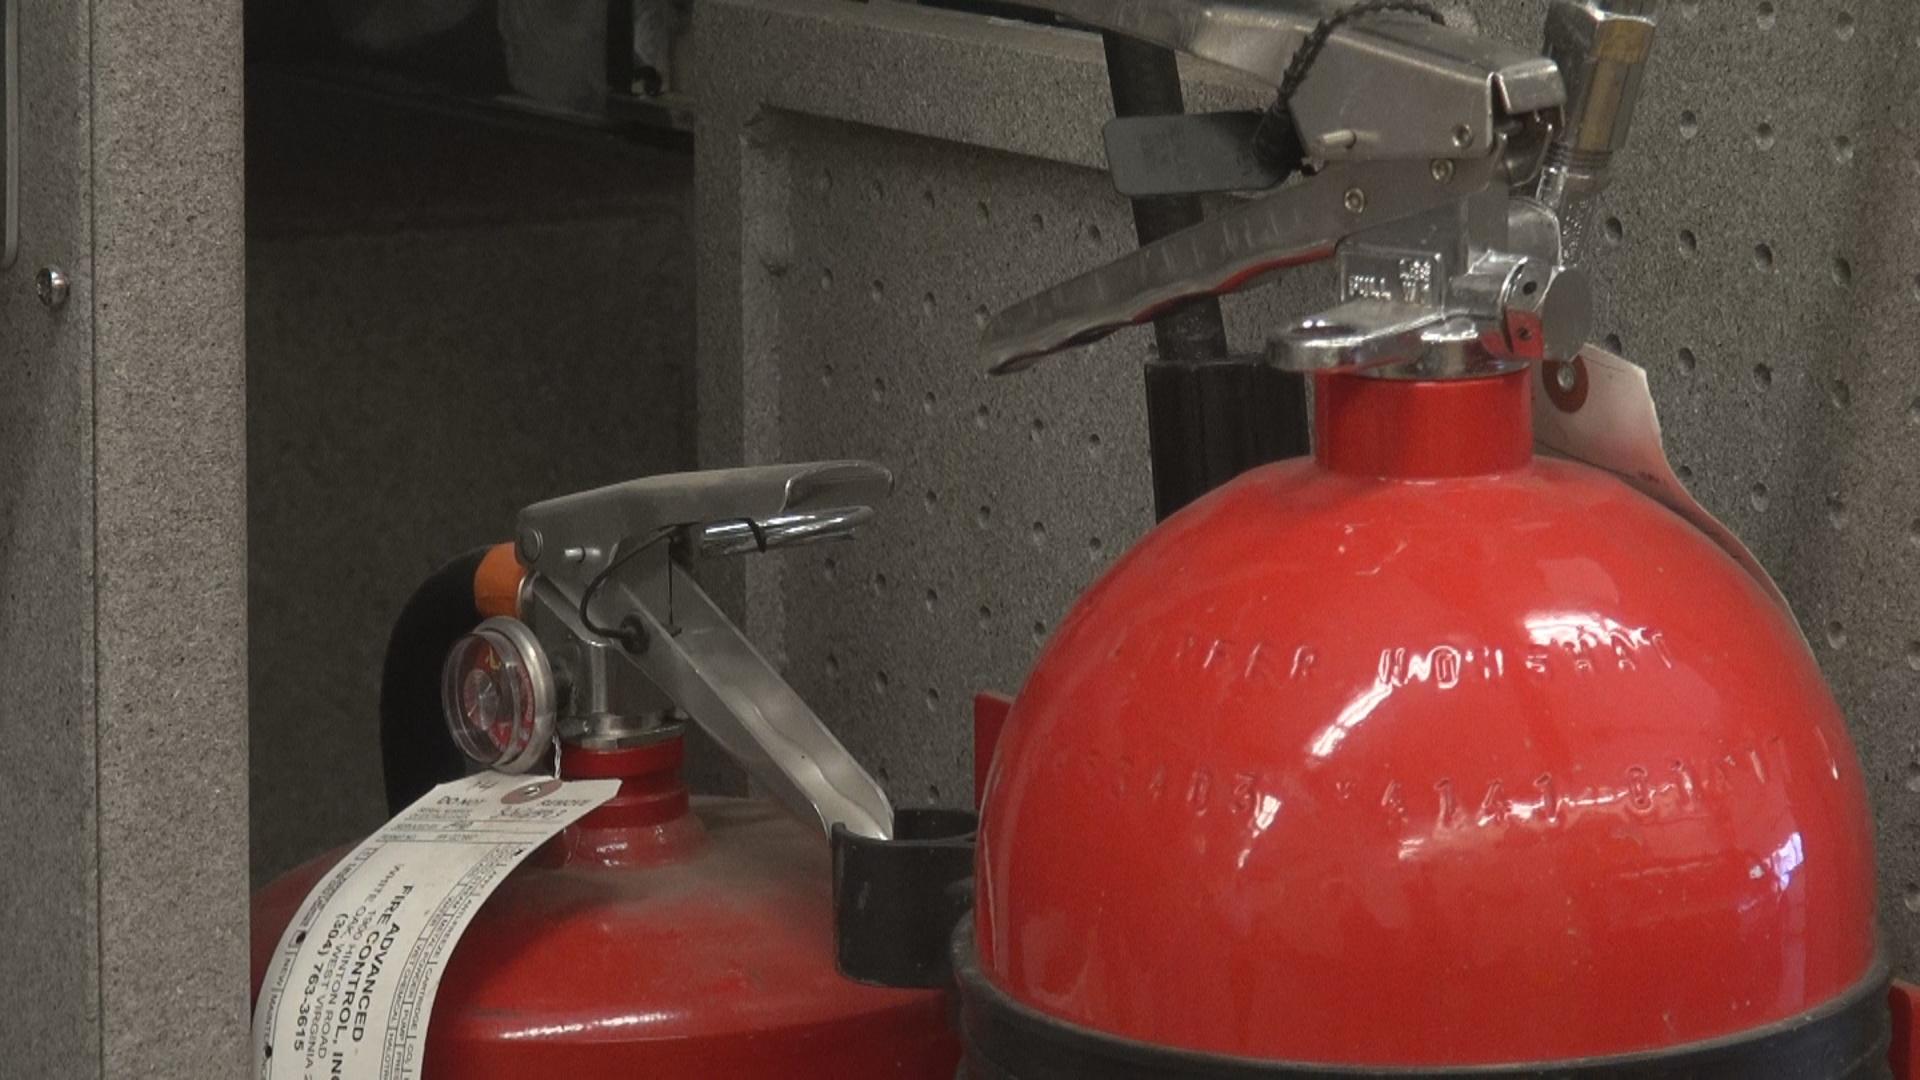 dryer fire safety